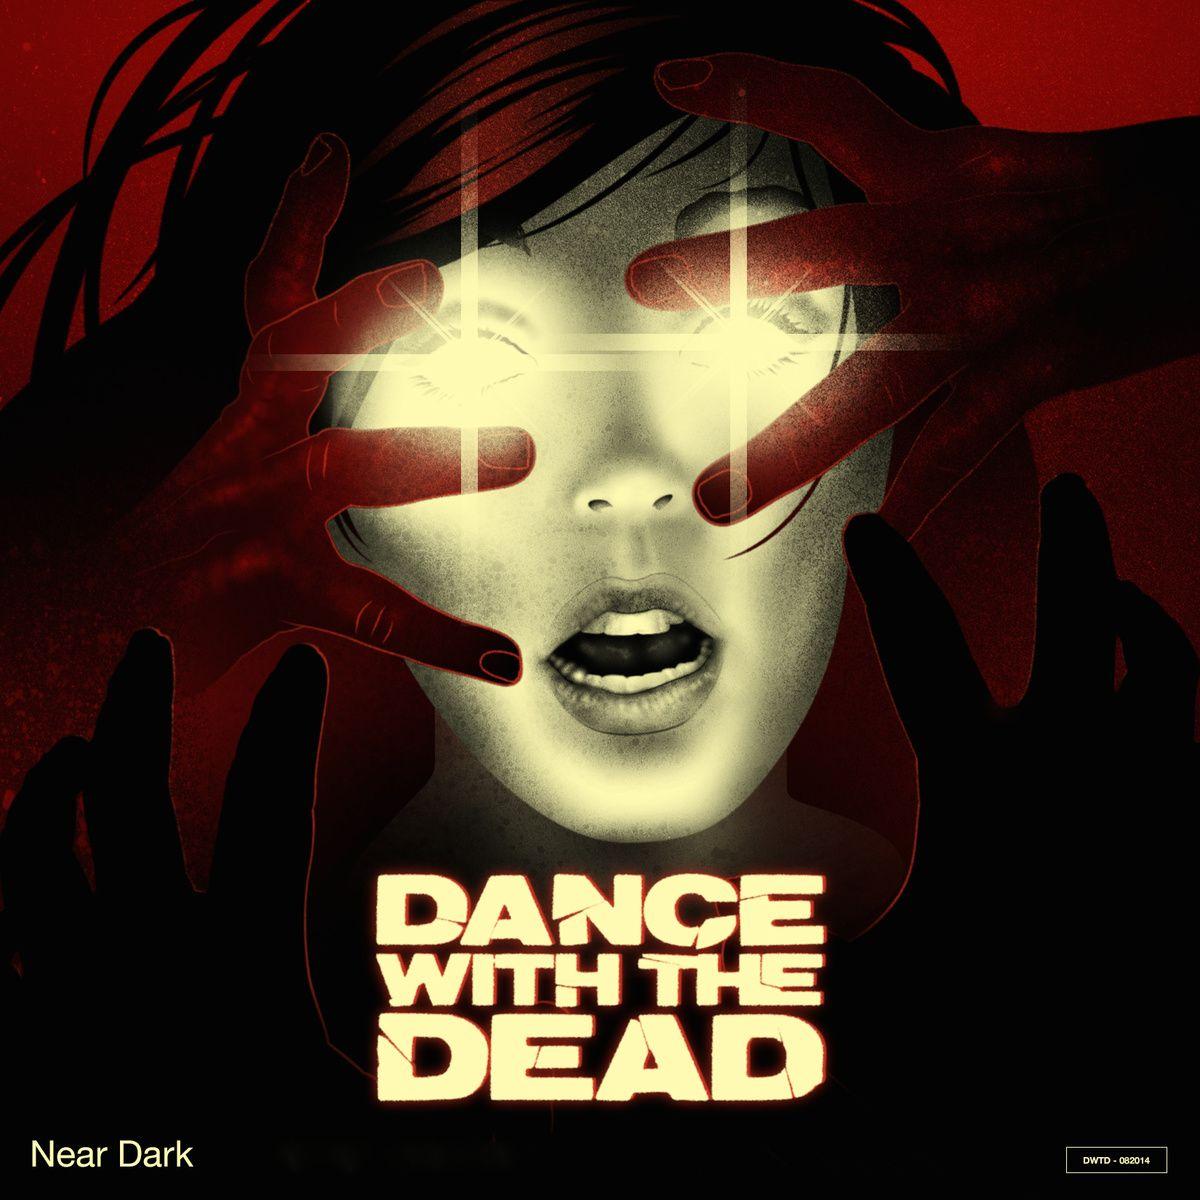 Near Dark Cover Art Near Dark Music Album Cover Music Album Covers